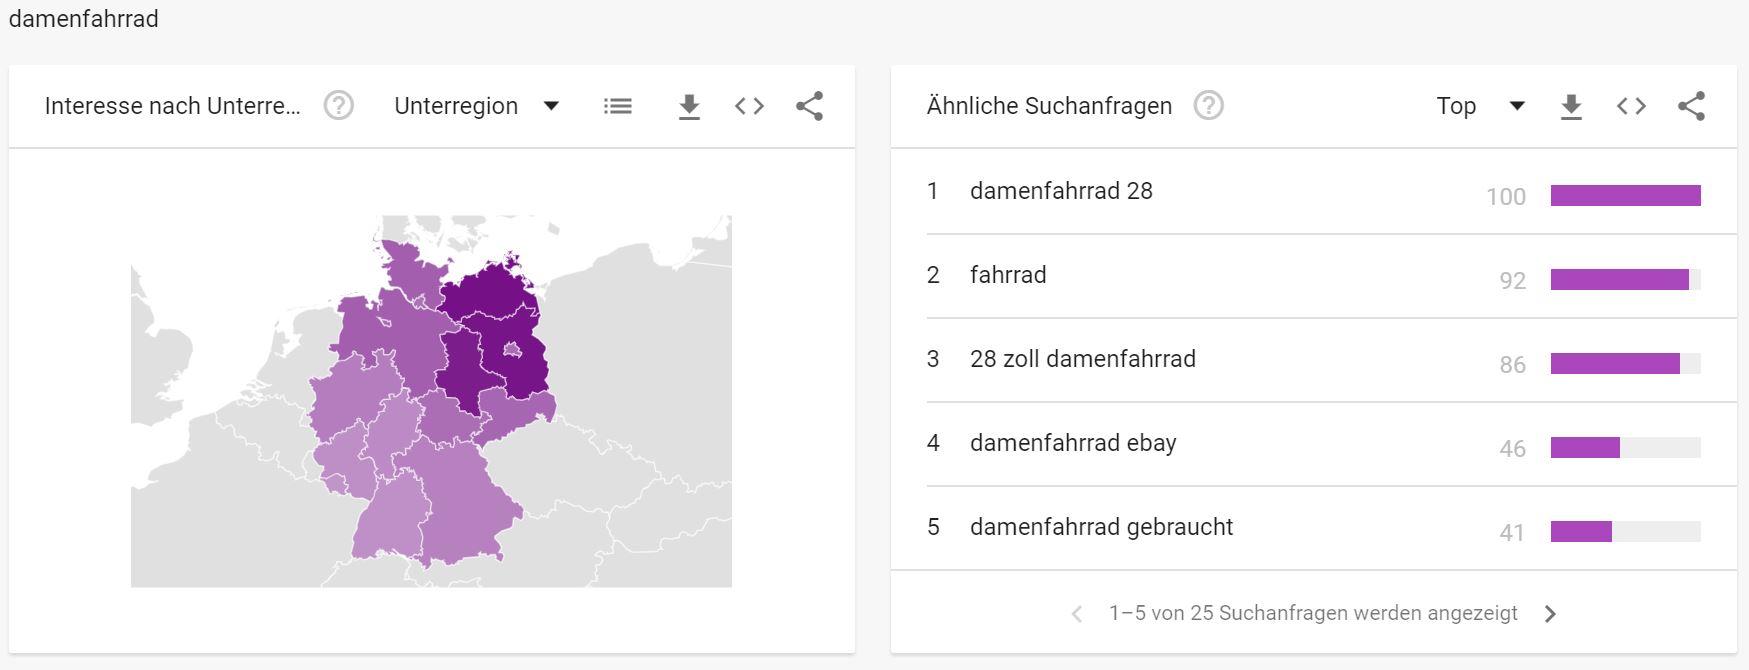 Google Trends - Interessante Suchbegriffe Fahrradbranche - Damenfahrrad